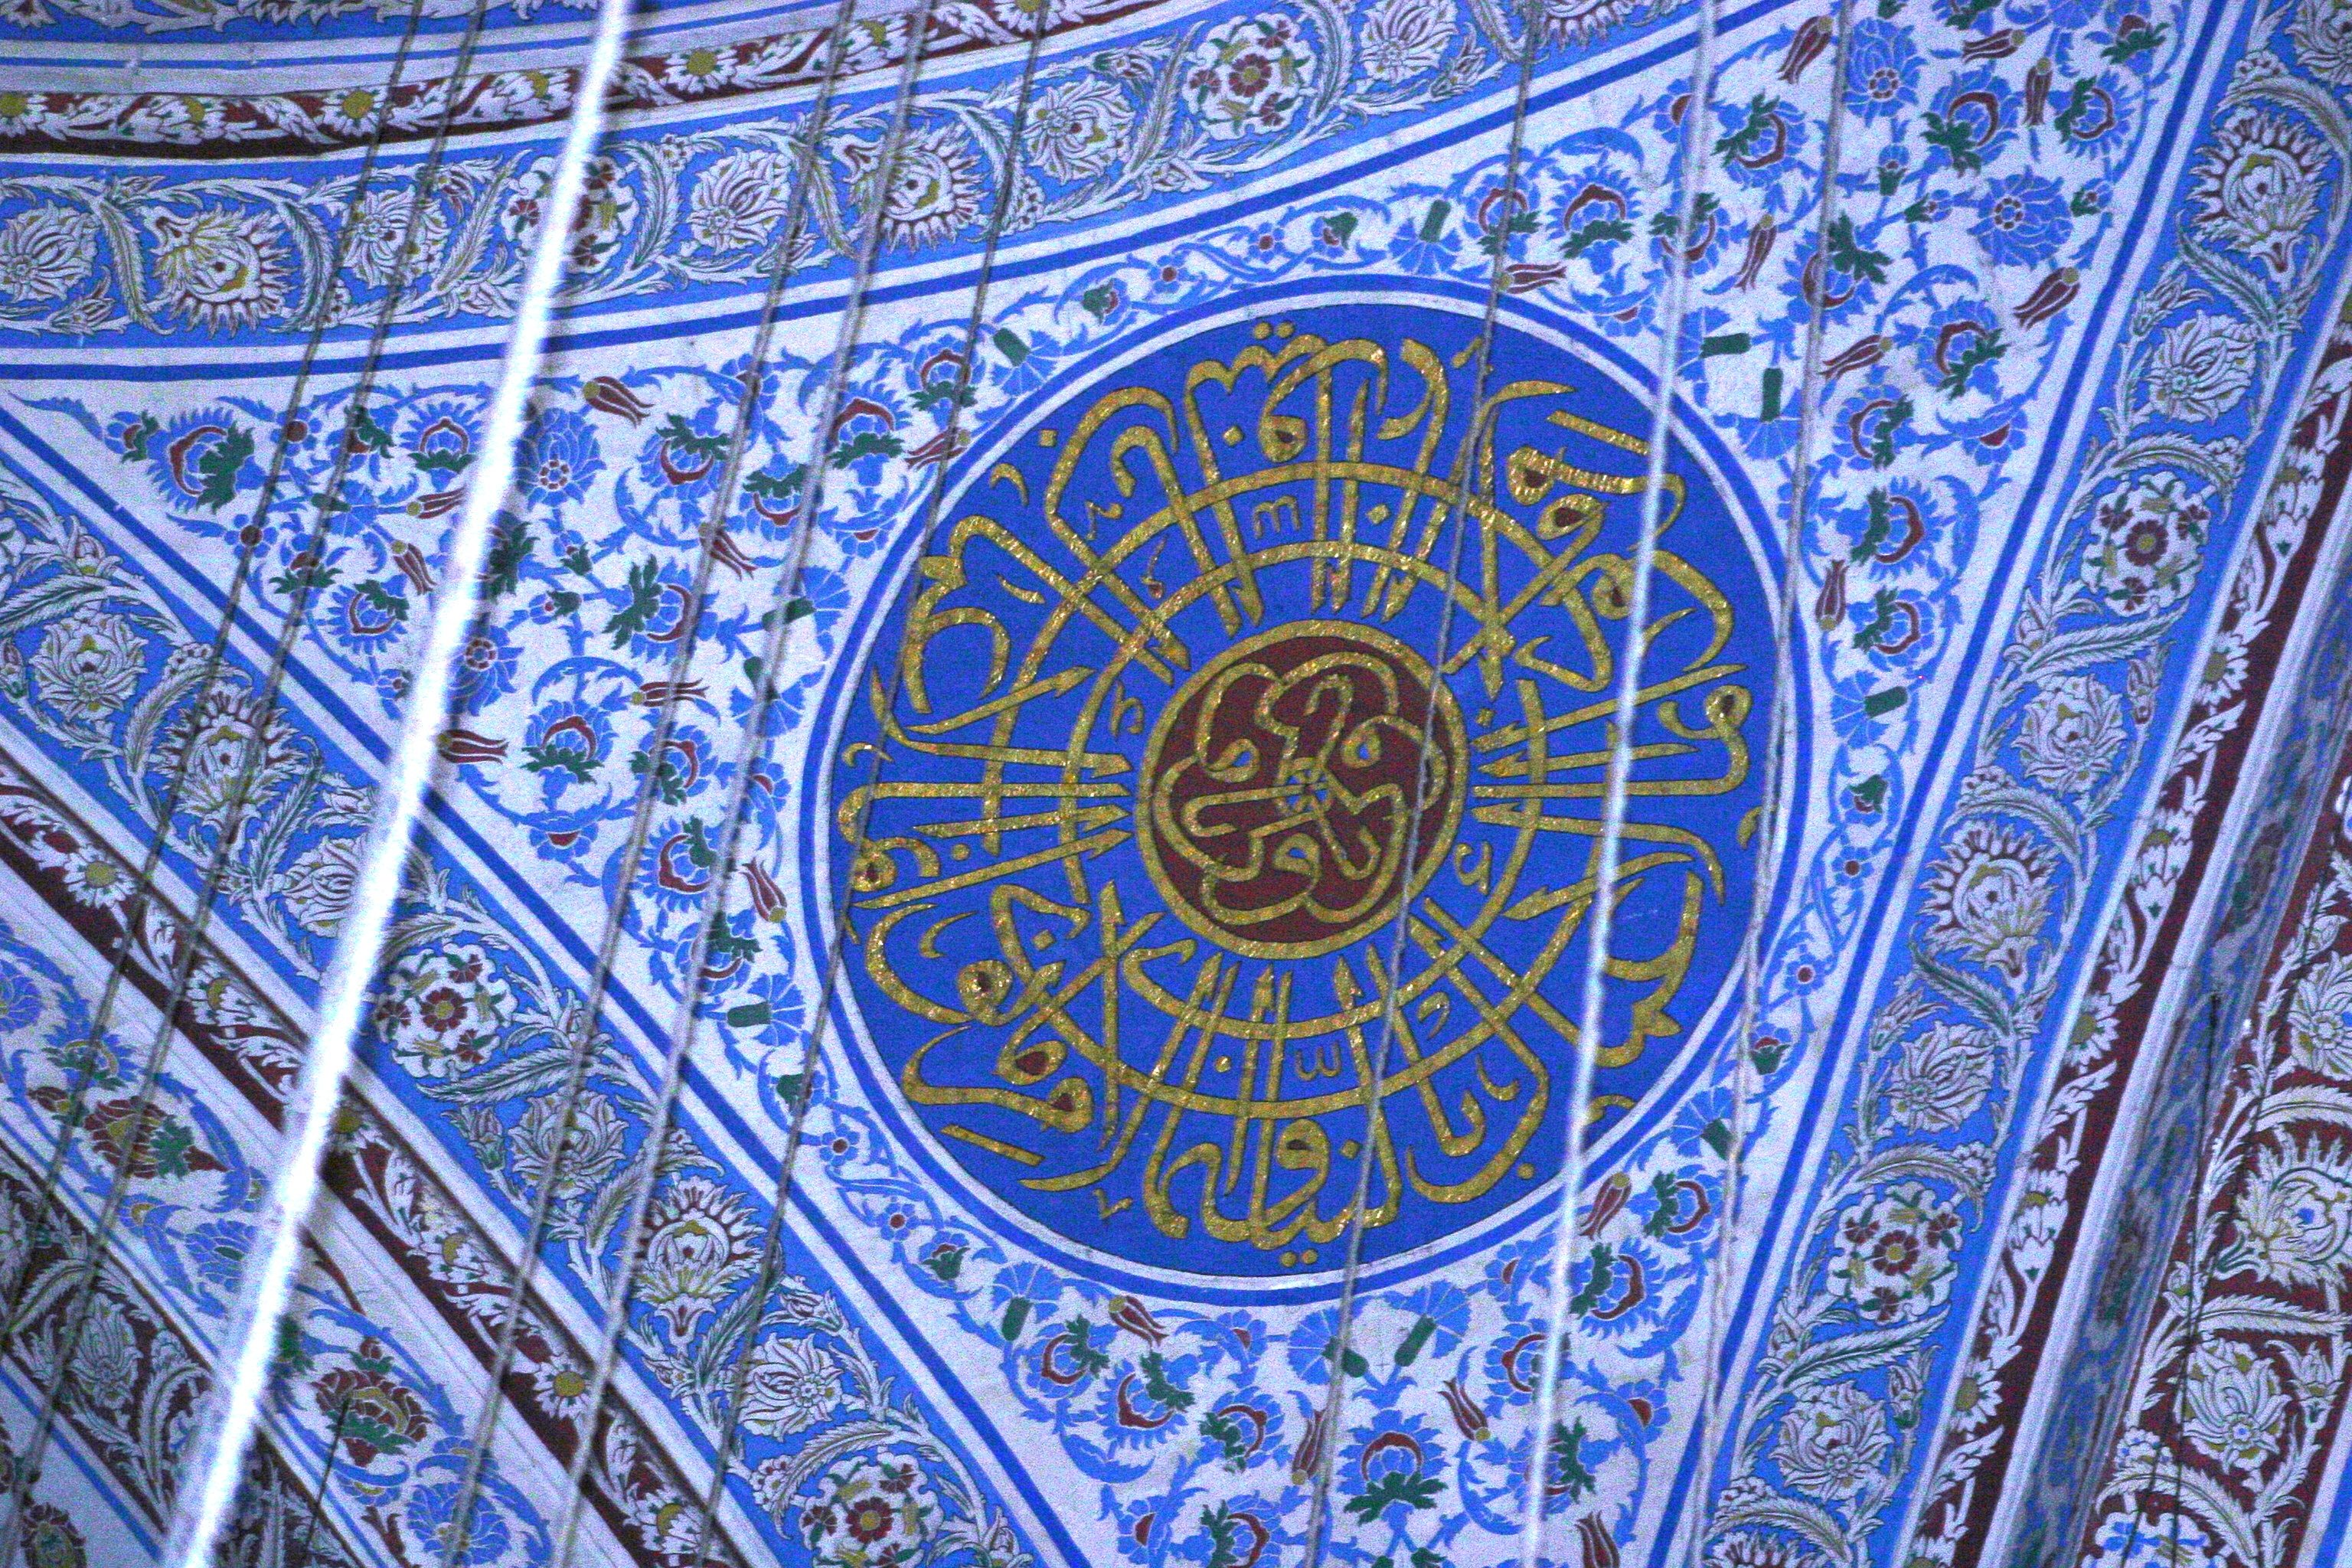 Majestic Blue Mosque in Turkey